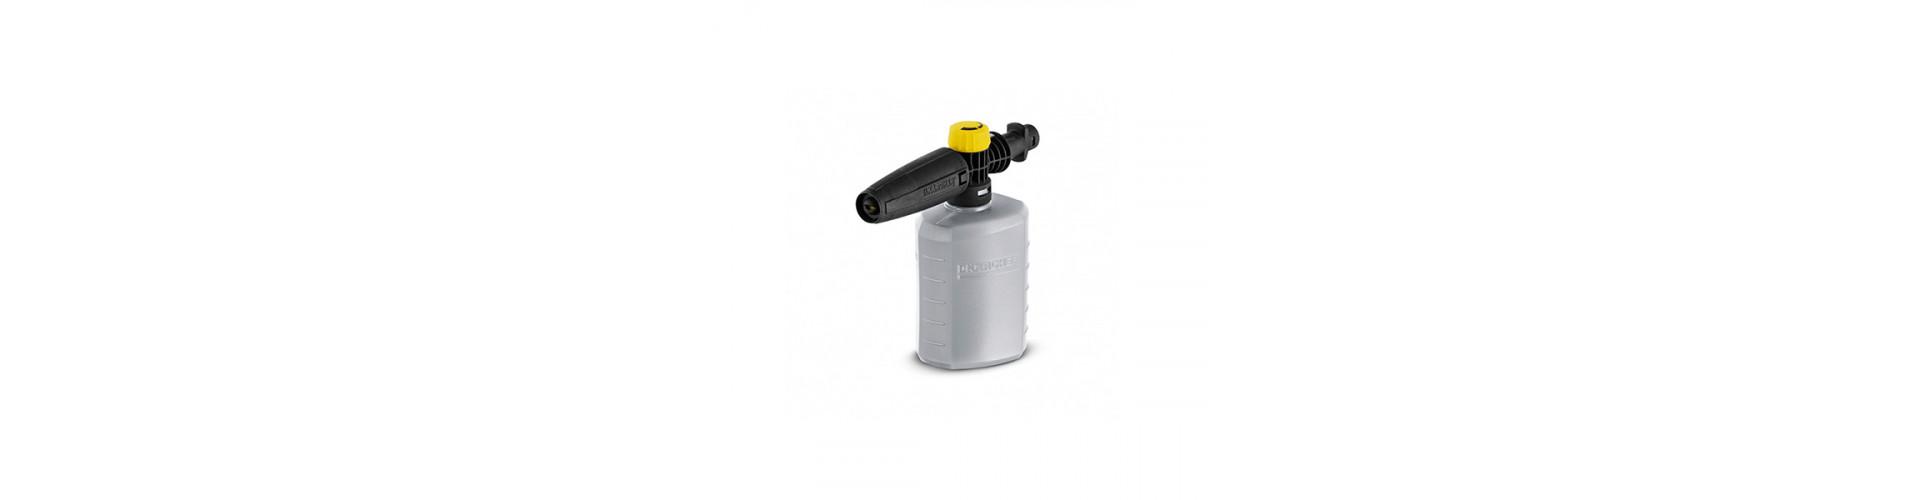 Пенная насадка Karcher 2.642-678.0 объем 0,6 L